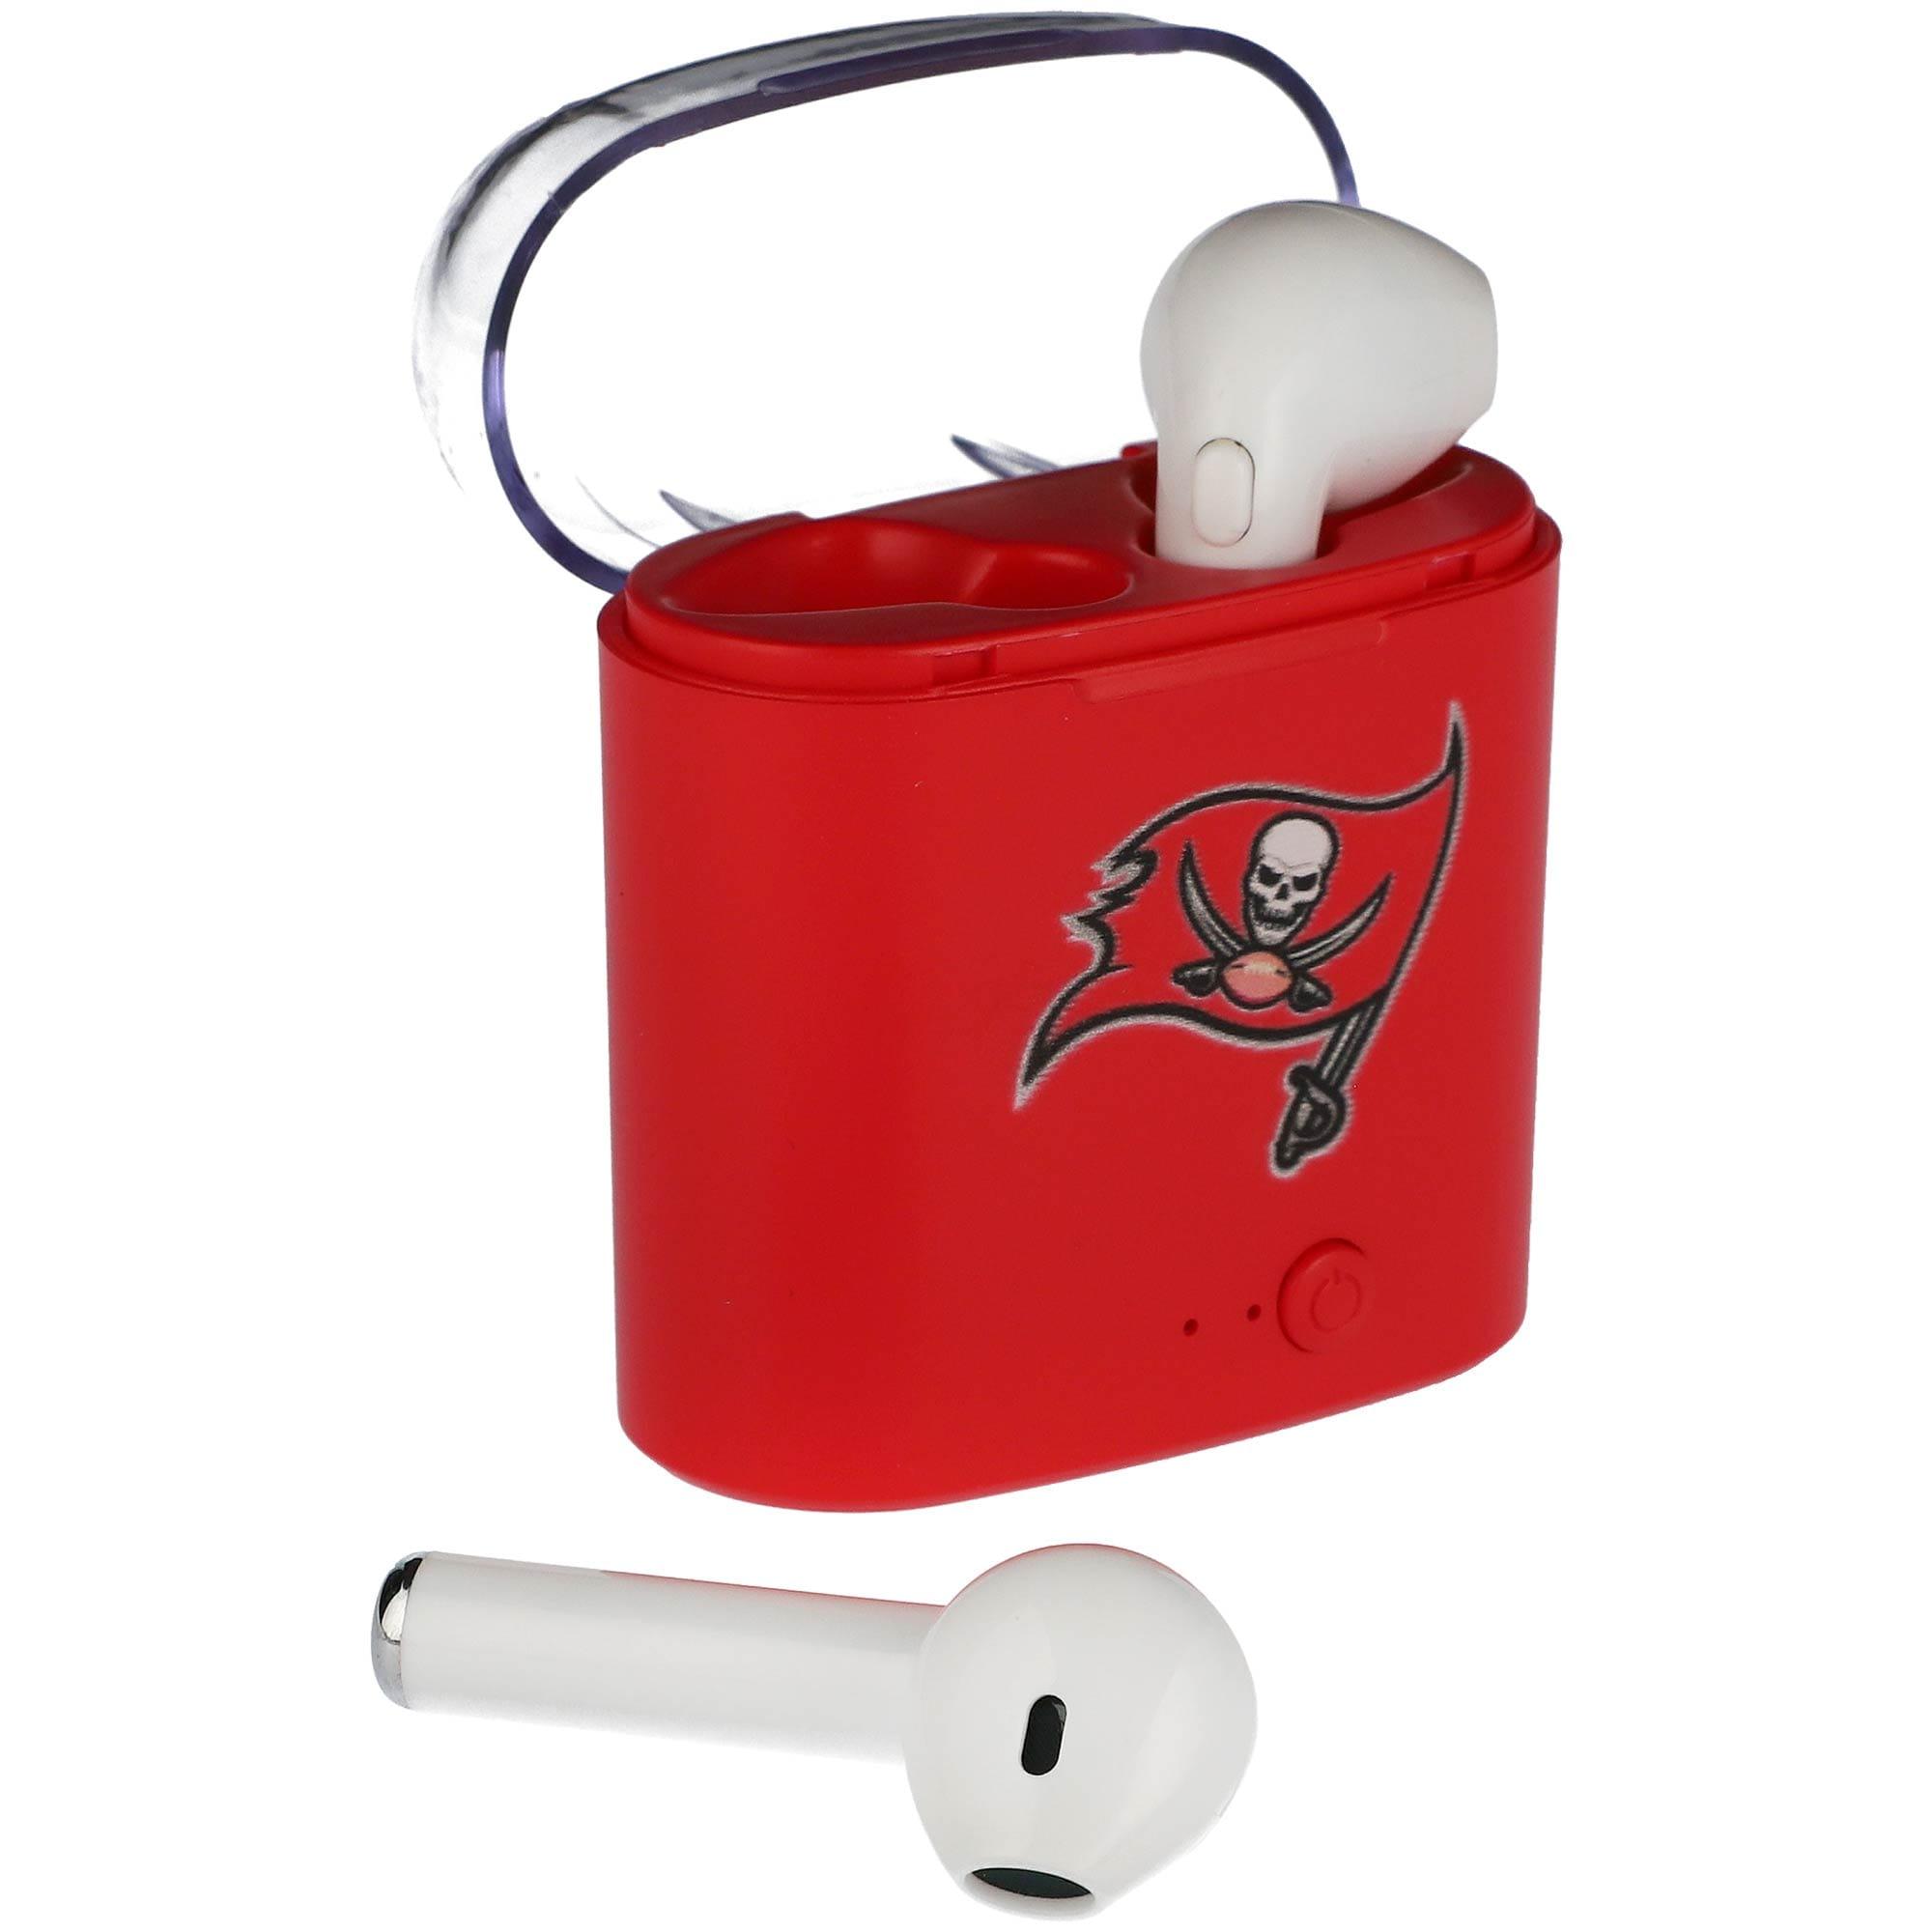 Tampa Bay Buccaneers True Wireless Bluetooth Earbud Headphones